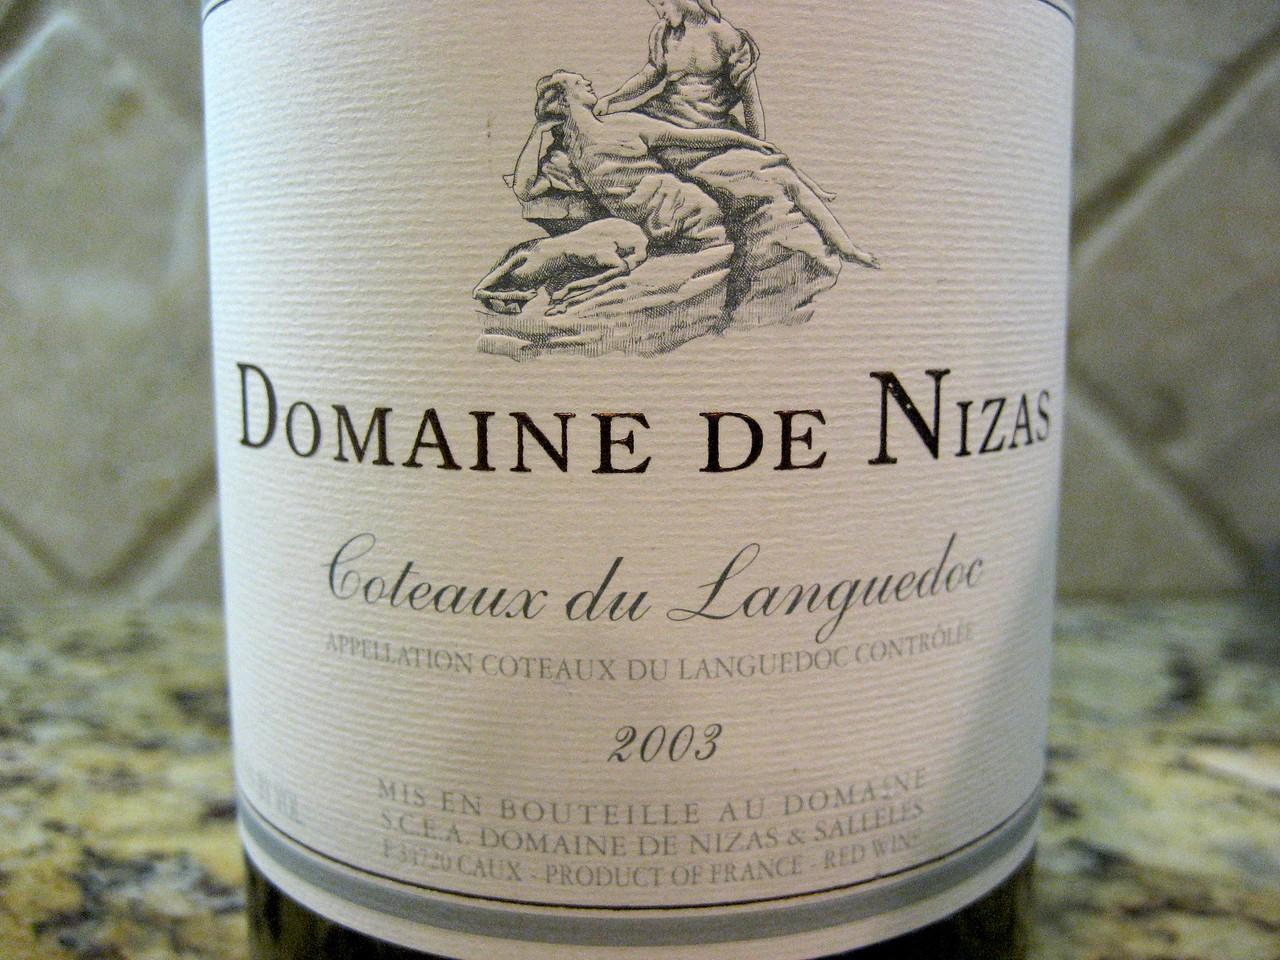 Domaine de Nizas 2003